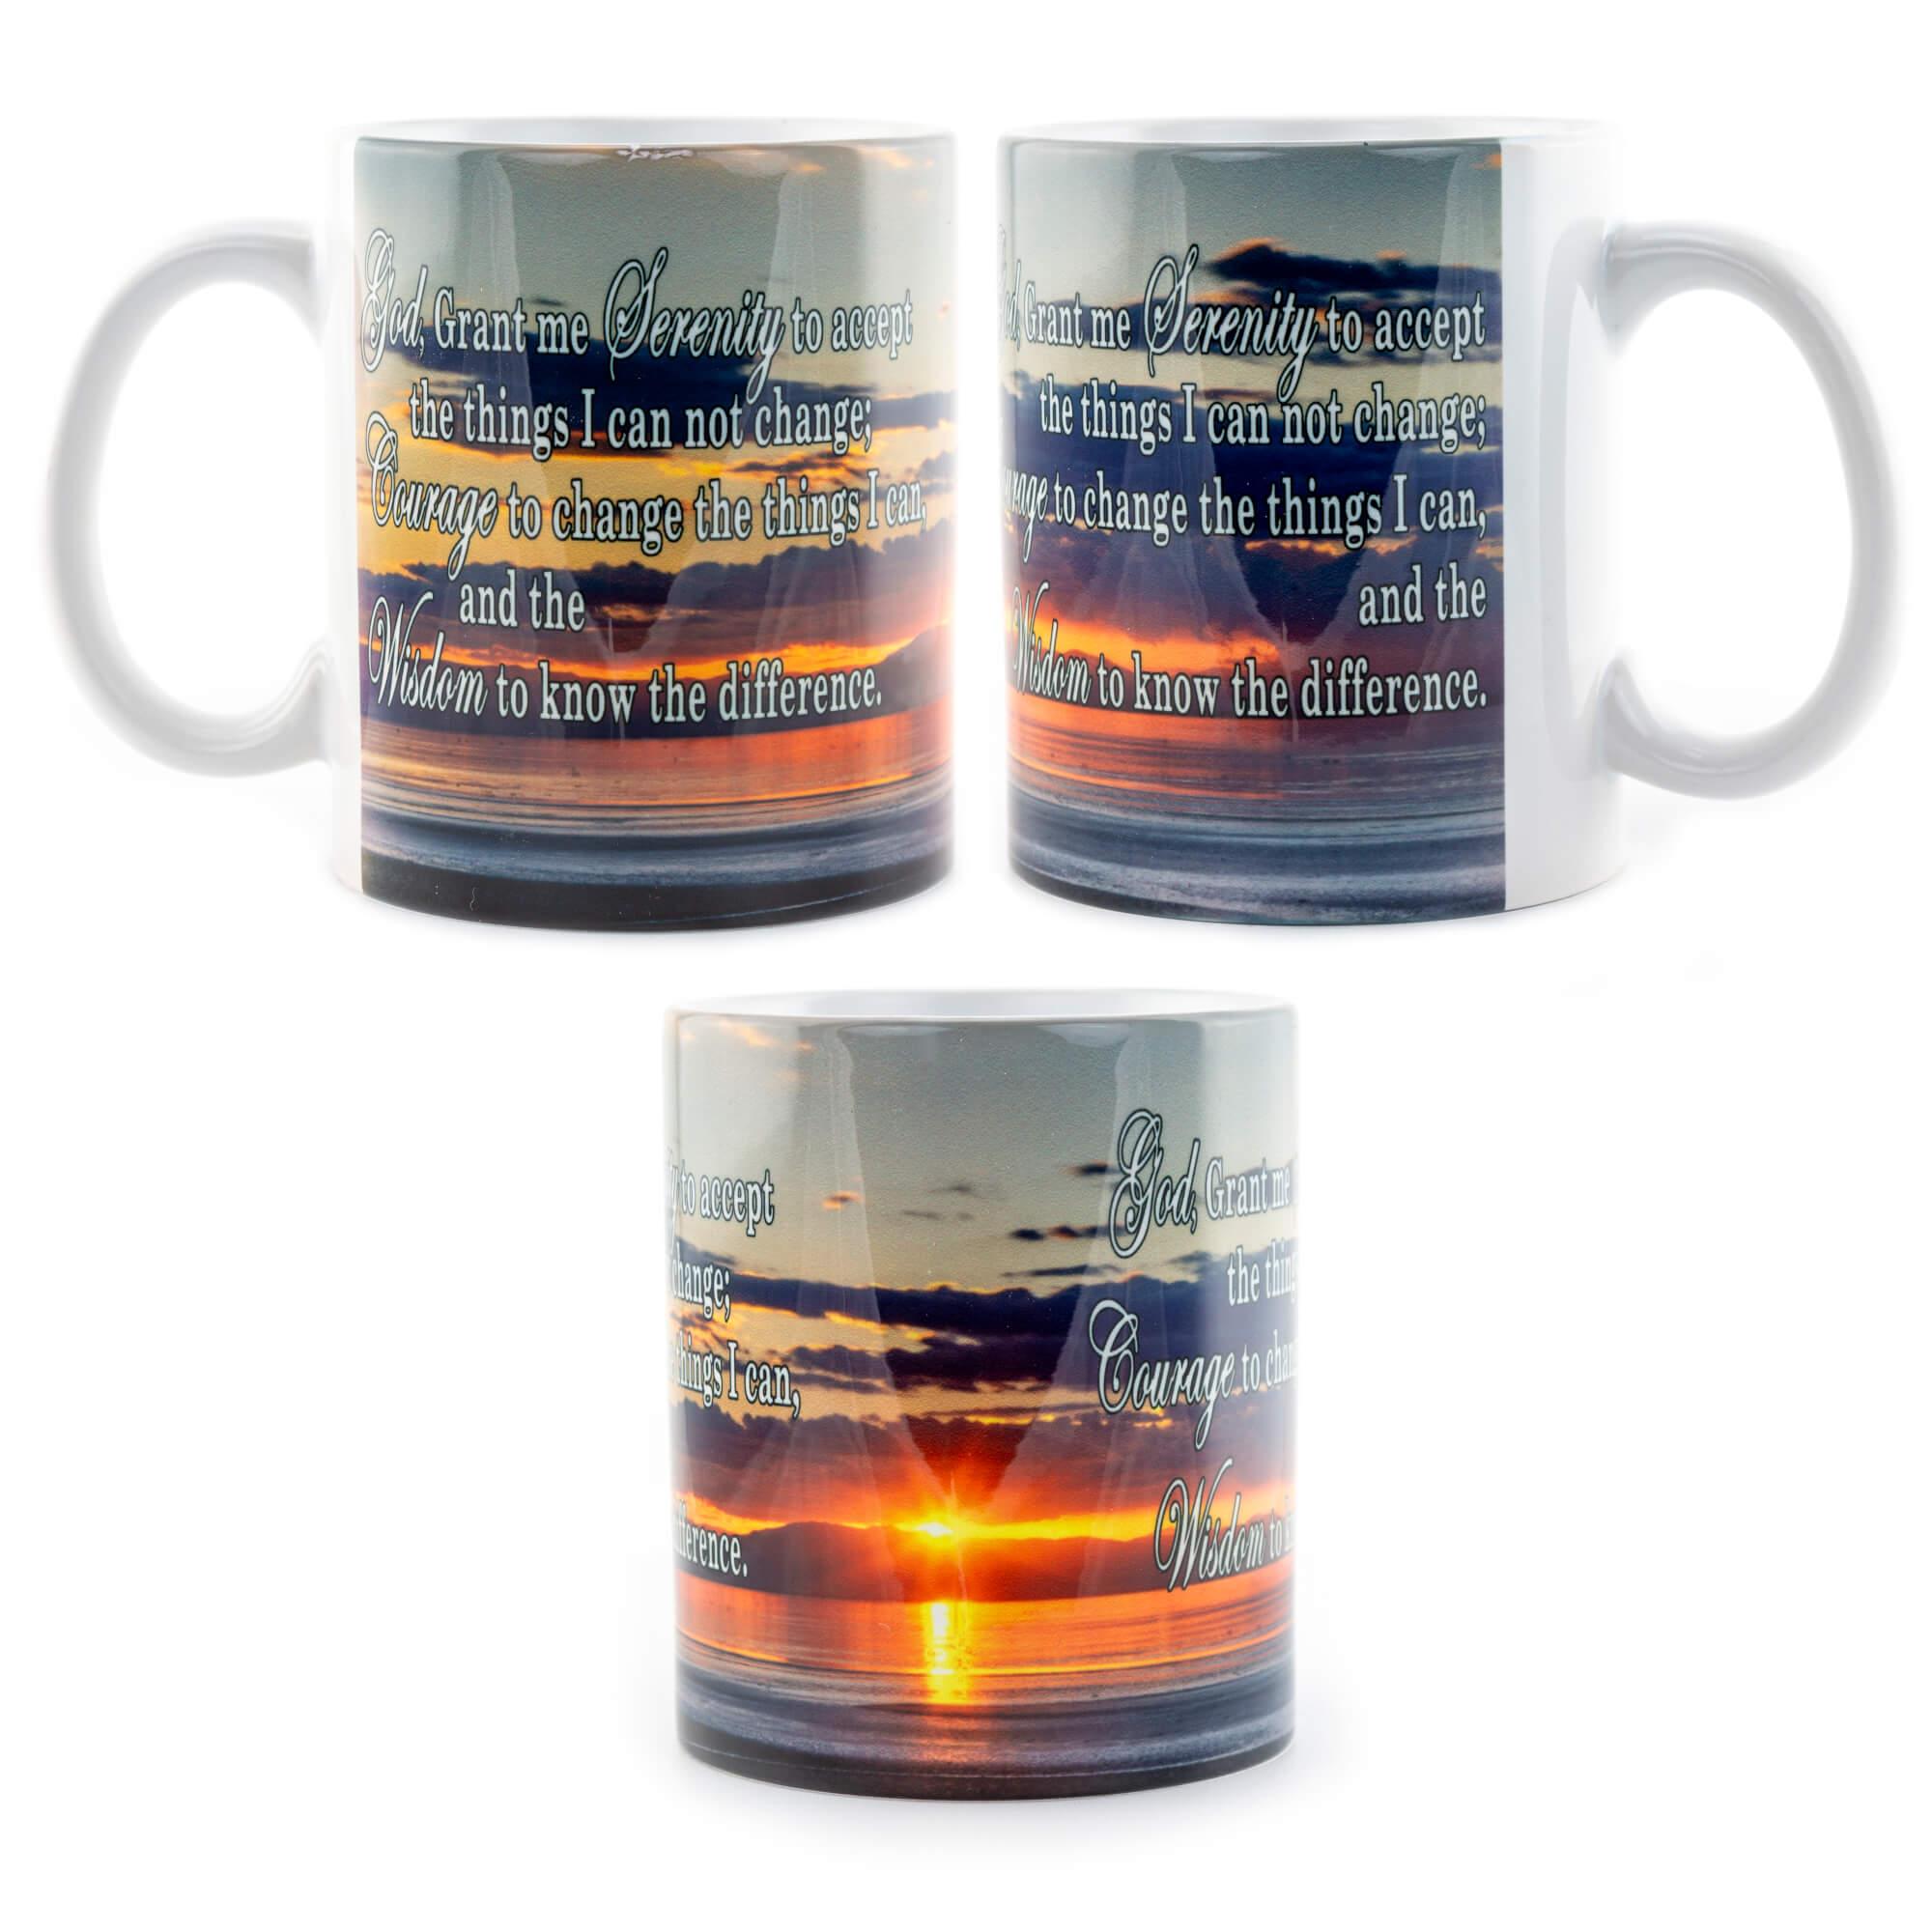 Salton Sea Sunset Serenity Prayer Mug